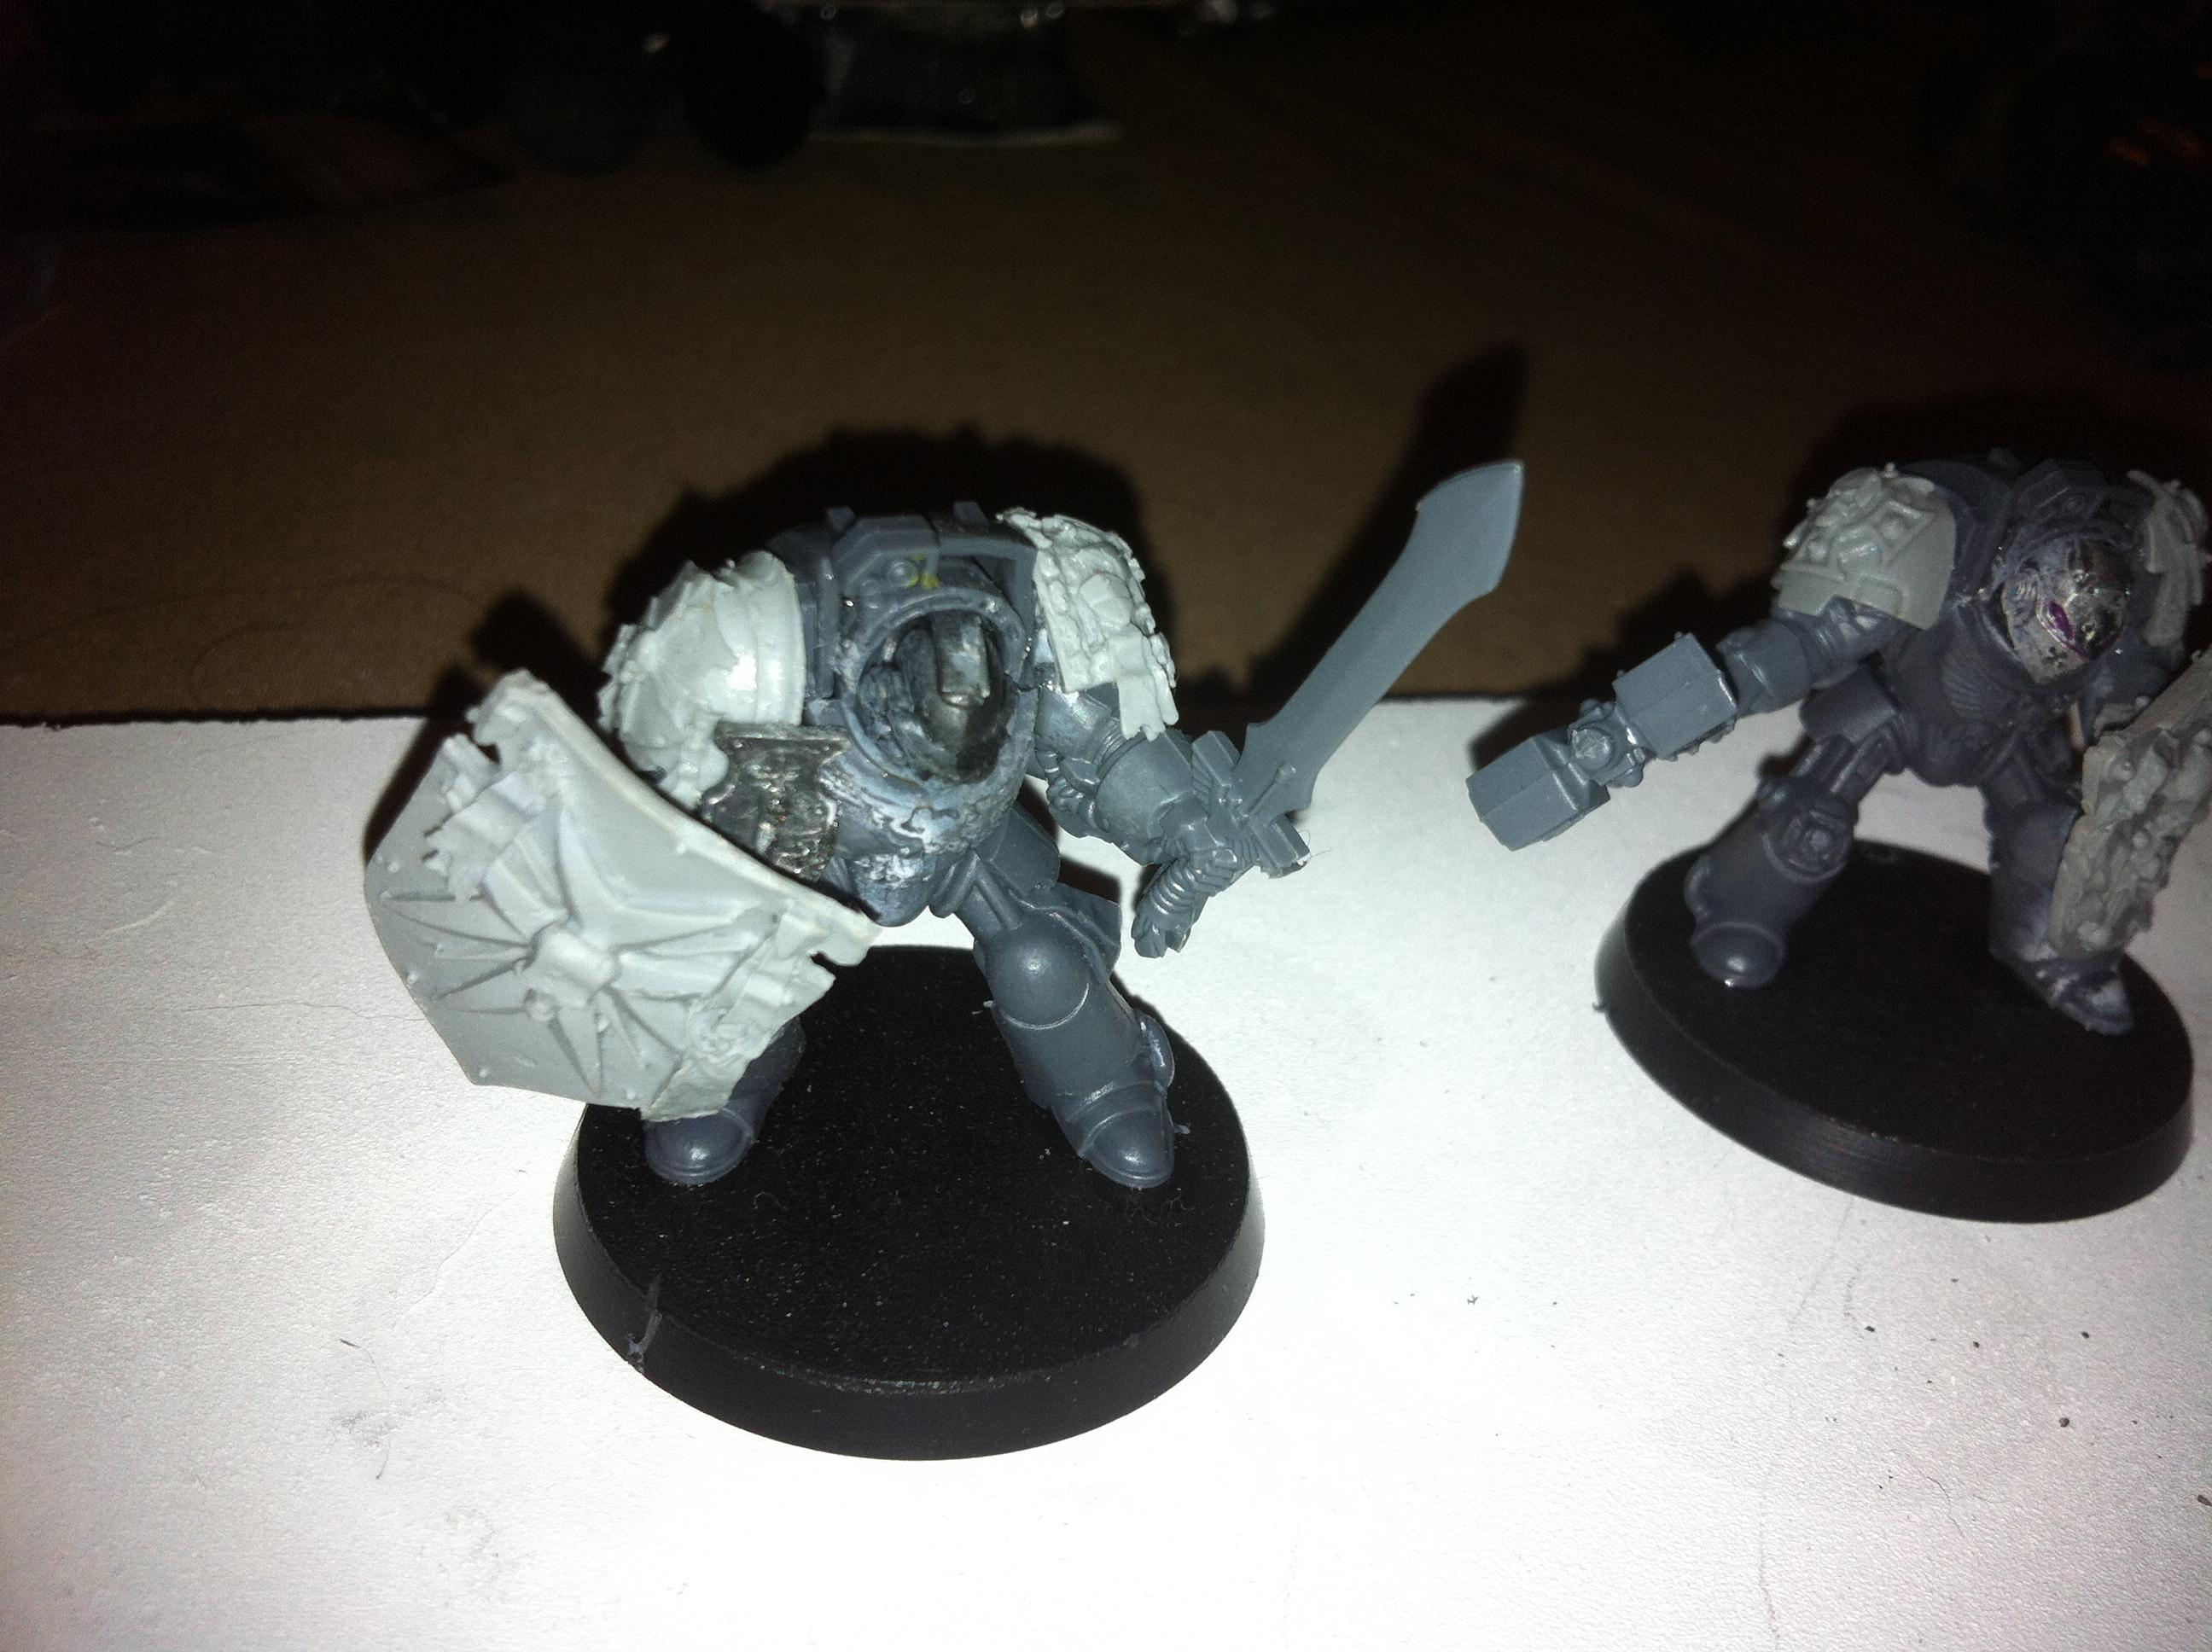 Black Templars Terminators 2